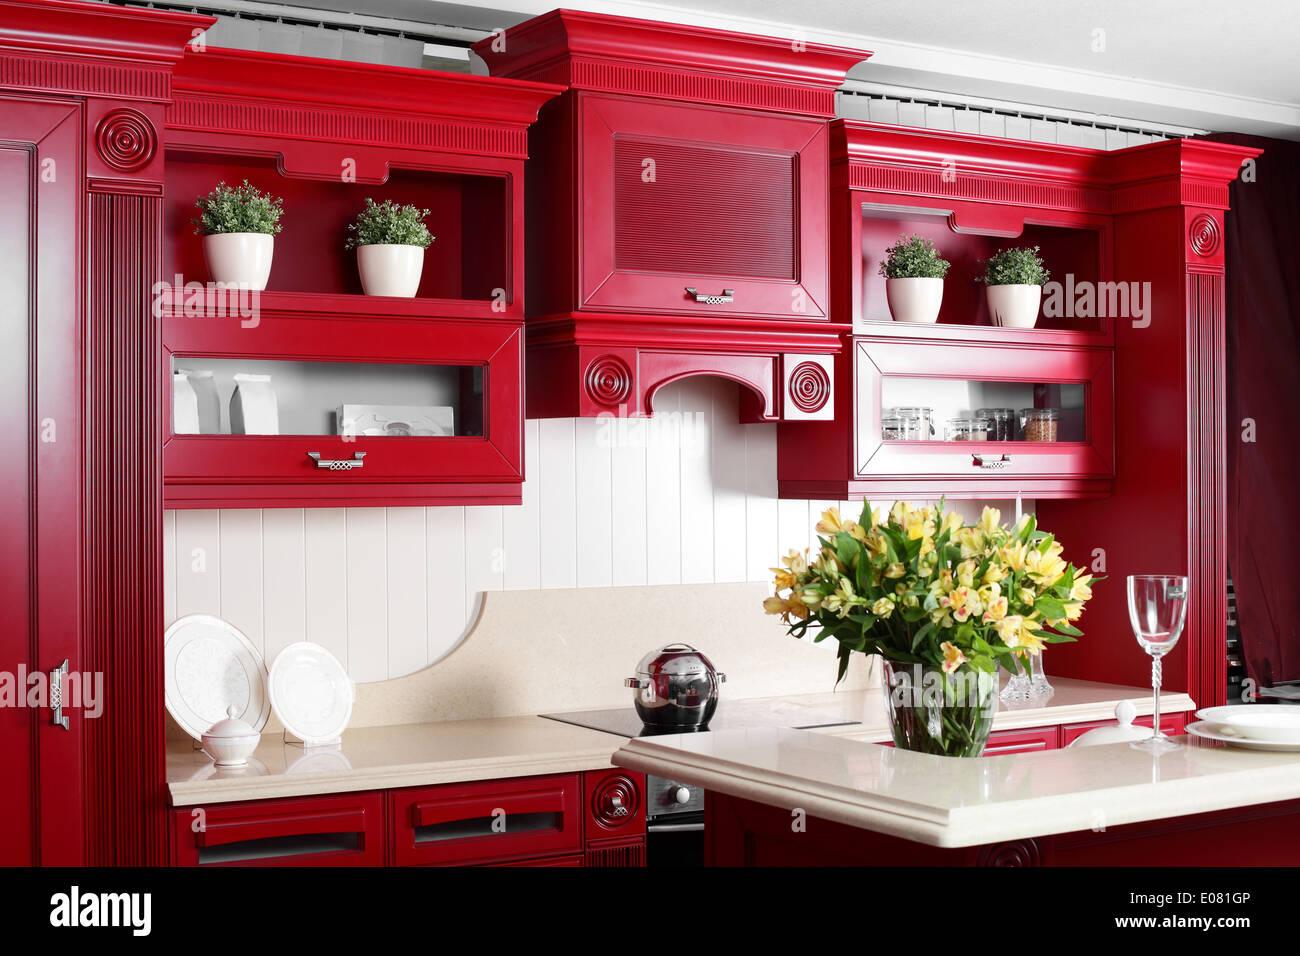 Luxury Red Kitchen Interior With Modern Furniture Stock Photo Alamy